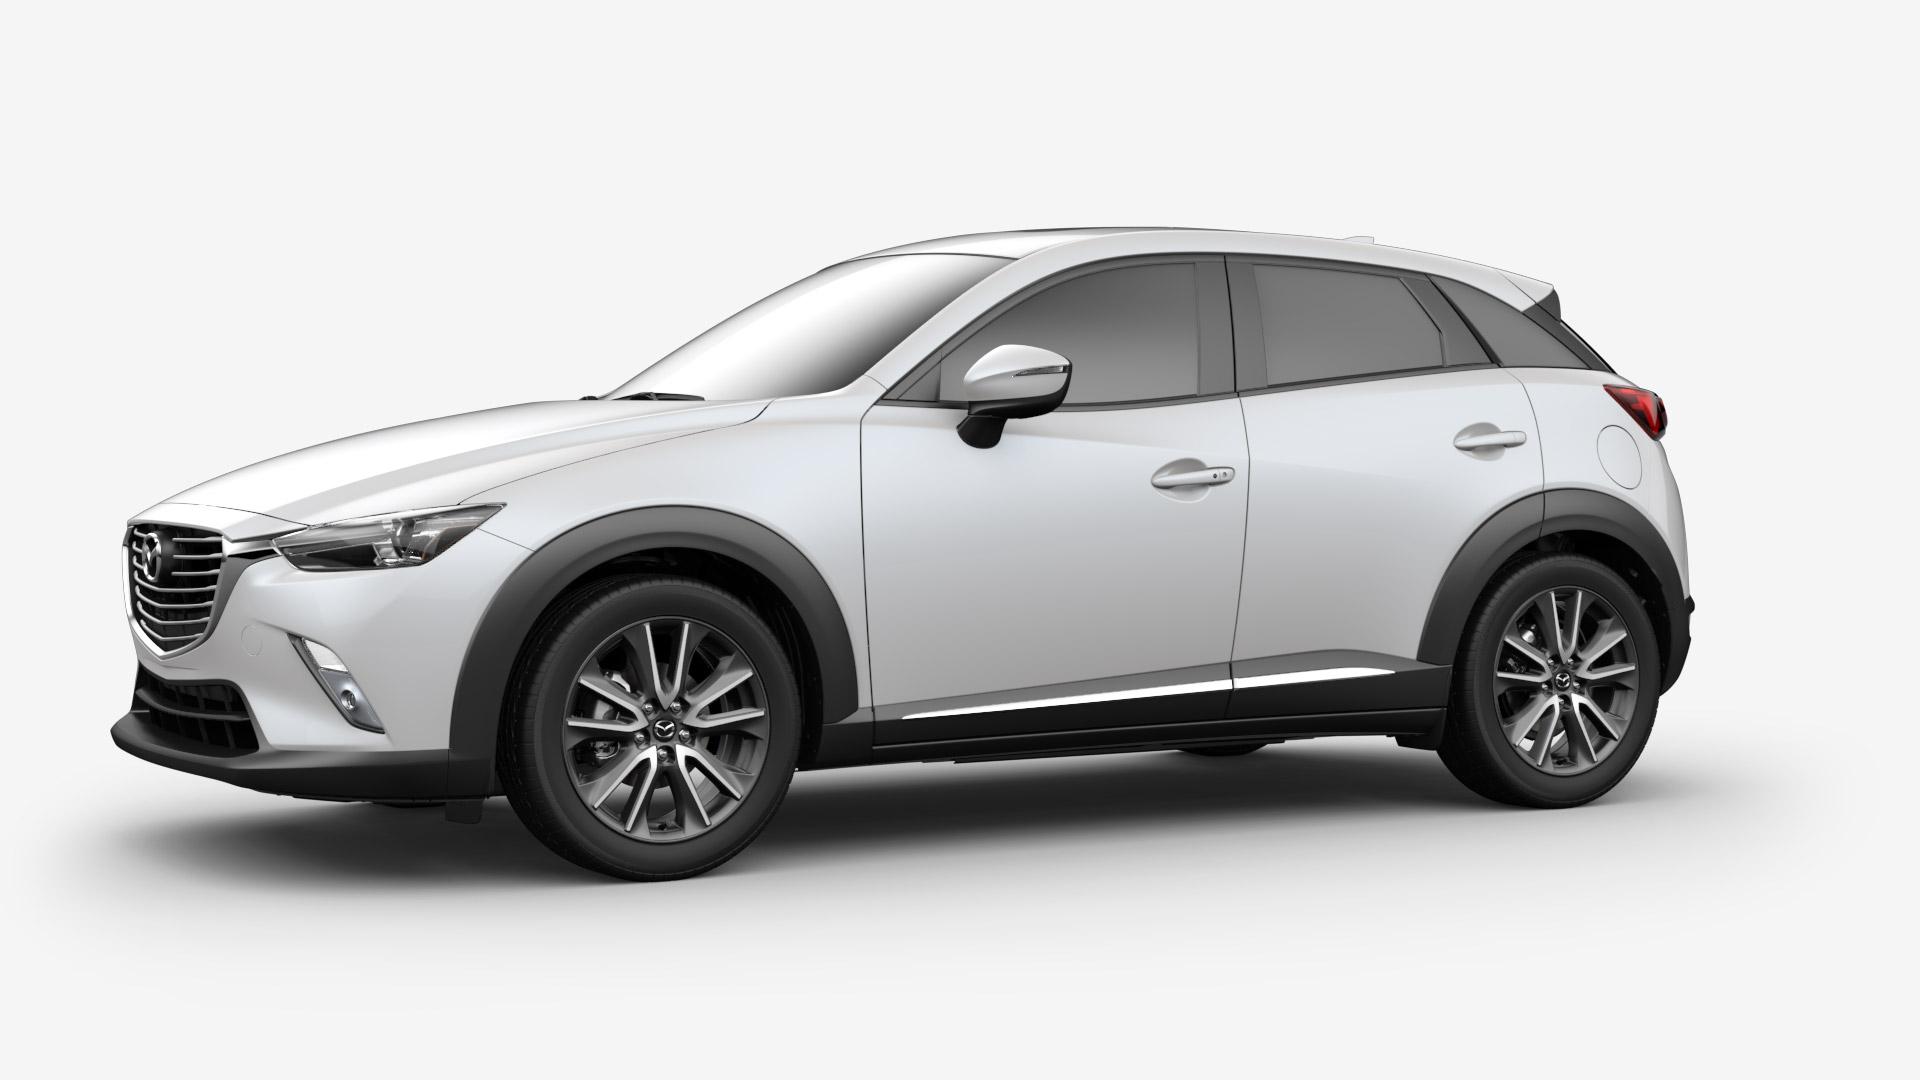 Kelebihan Mazda Cx 3 2018 Harga